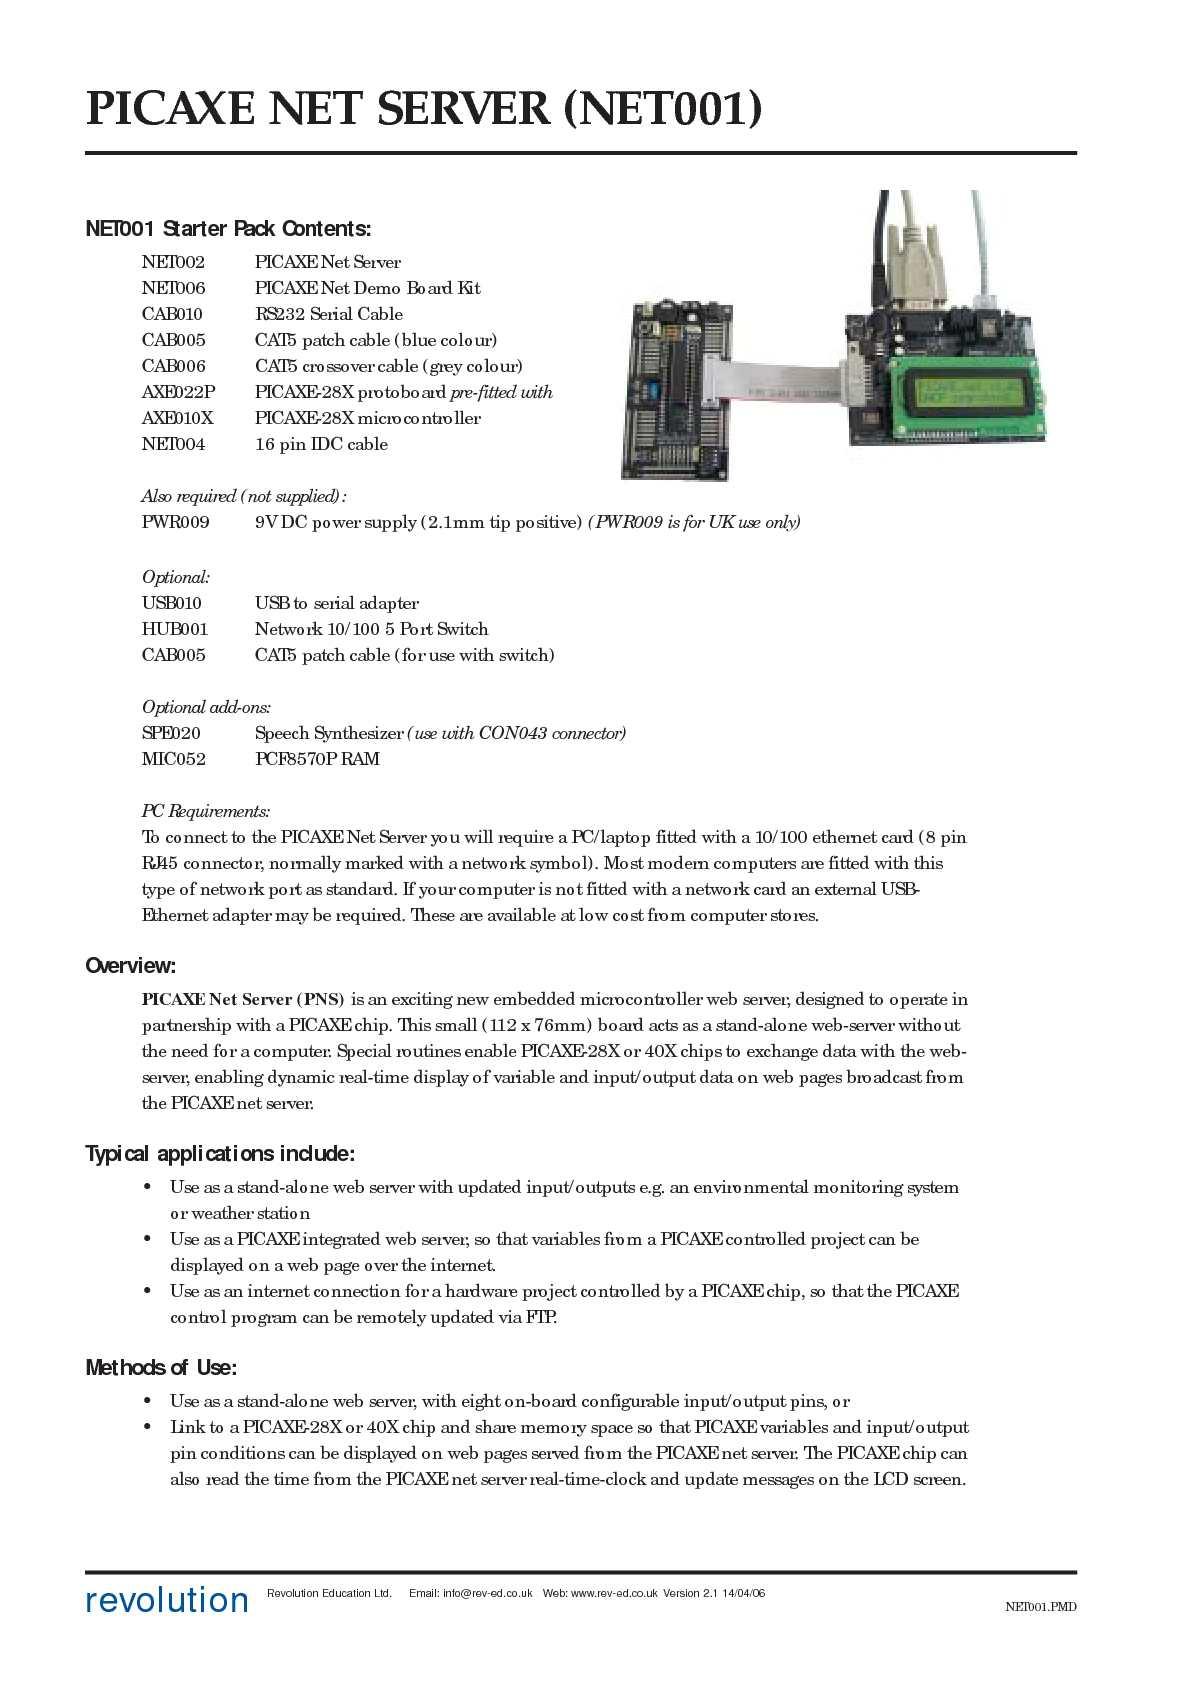 Calamo Net001 Datasheet 9vdc Power Supply Regulated 7 Segment Display Circuit Diagram